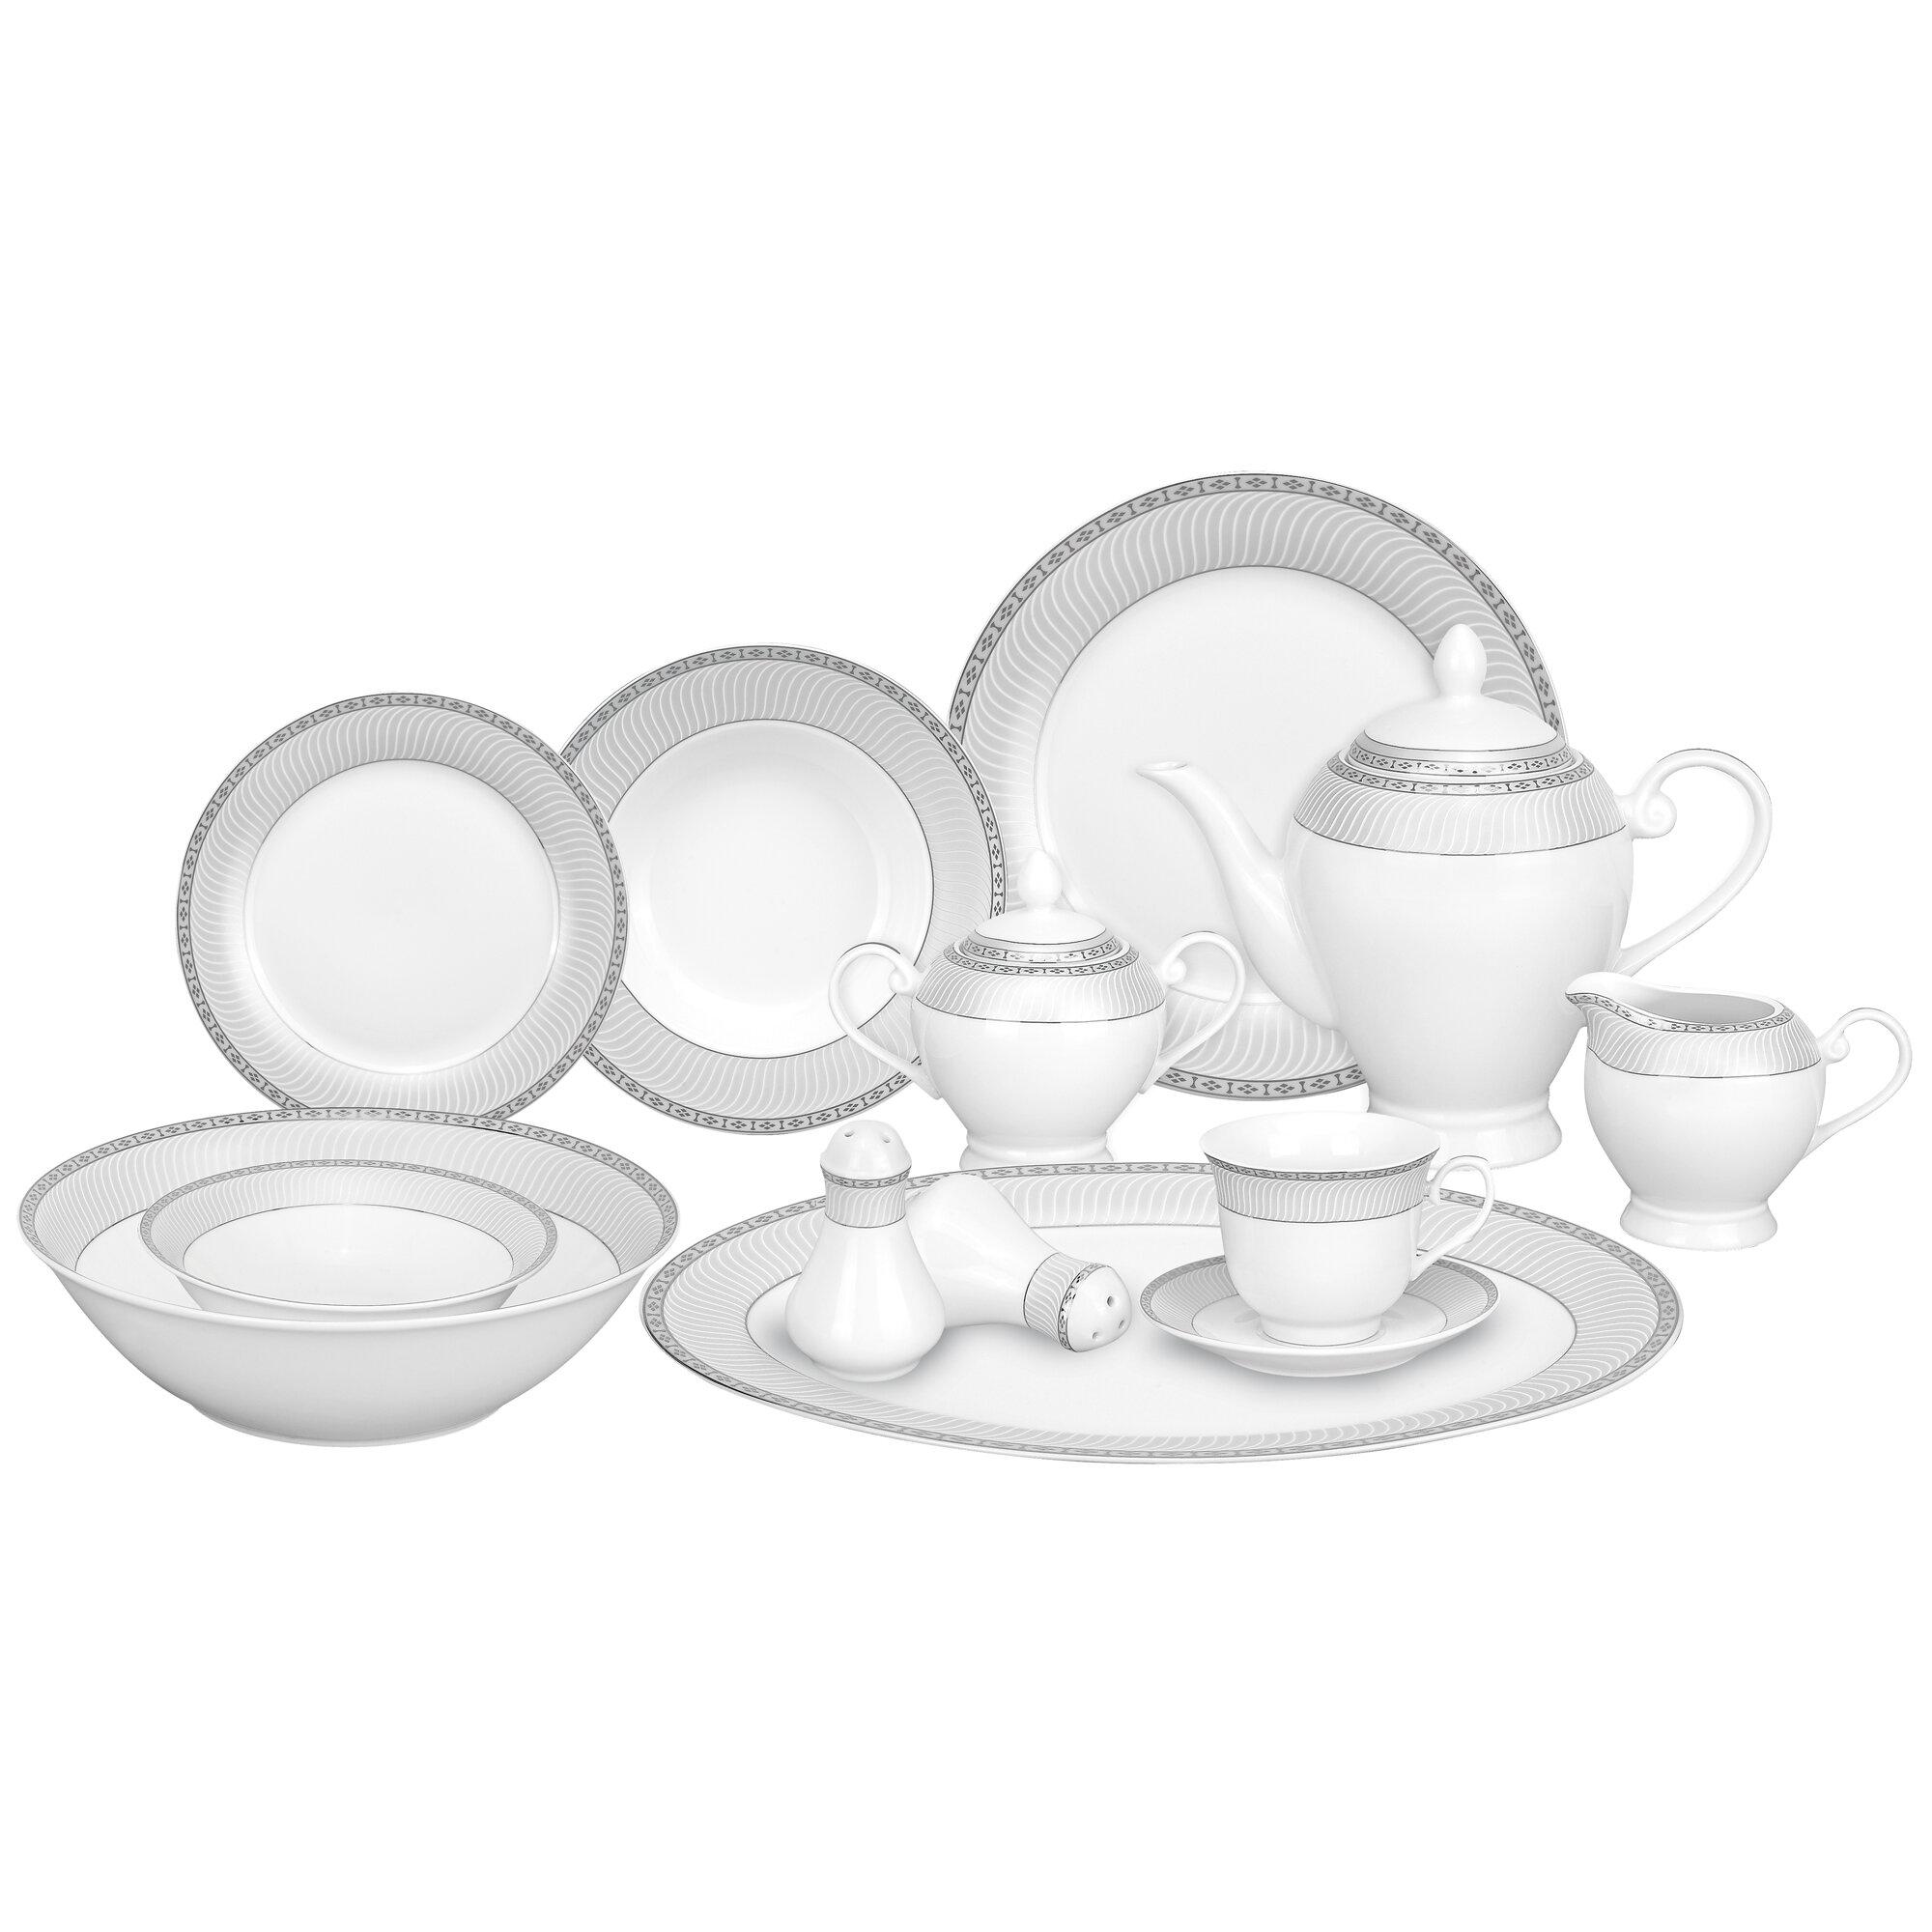 Lorren Home Trends Alina Porcelain 57 Piece Dinnerware Set Service for 8 u0026 Reviews   Wayfair  sc 1 st  Wayfair & Lorren Home Trends Alina Porcelain 57 Piece Dinnerware Set Service ...